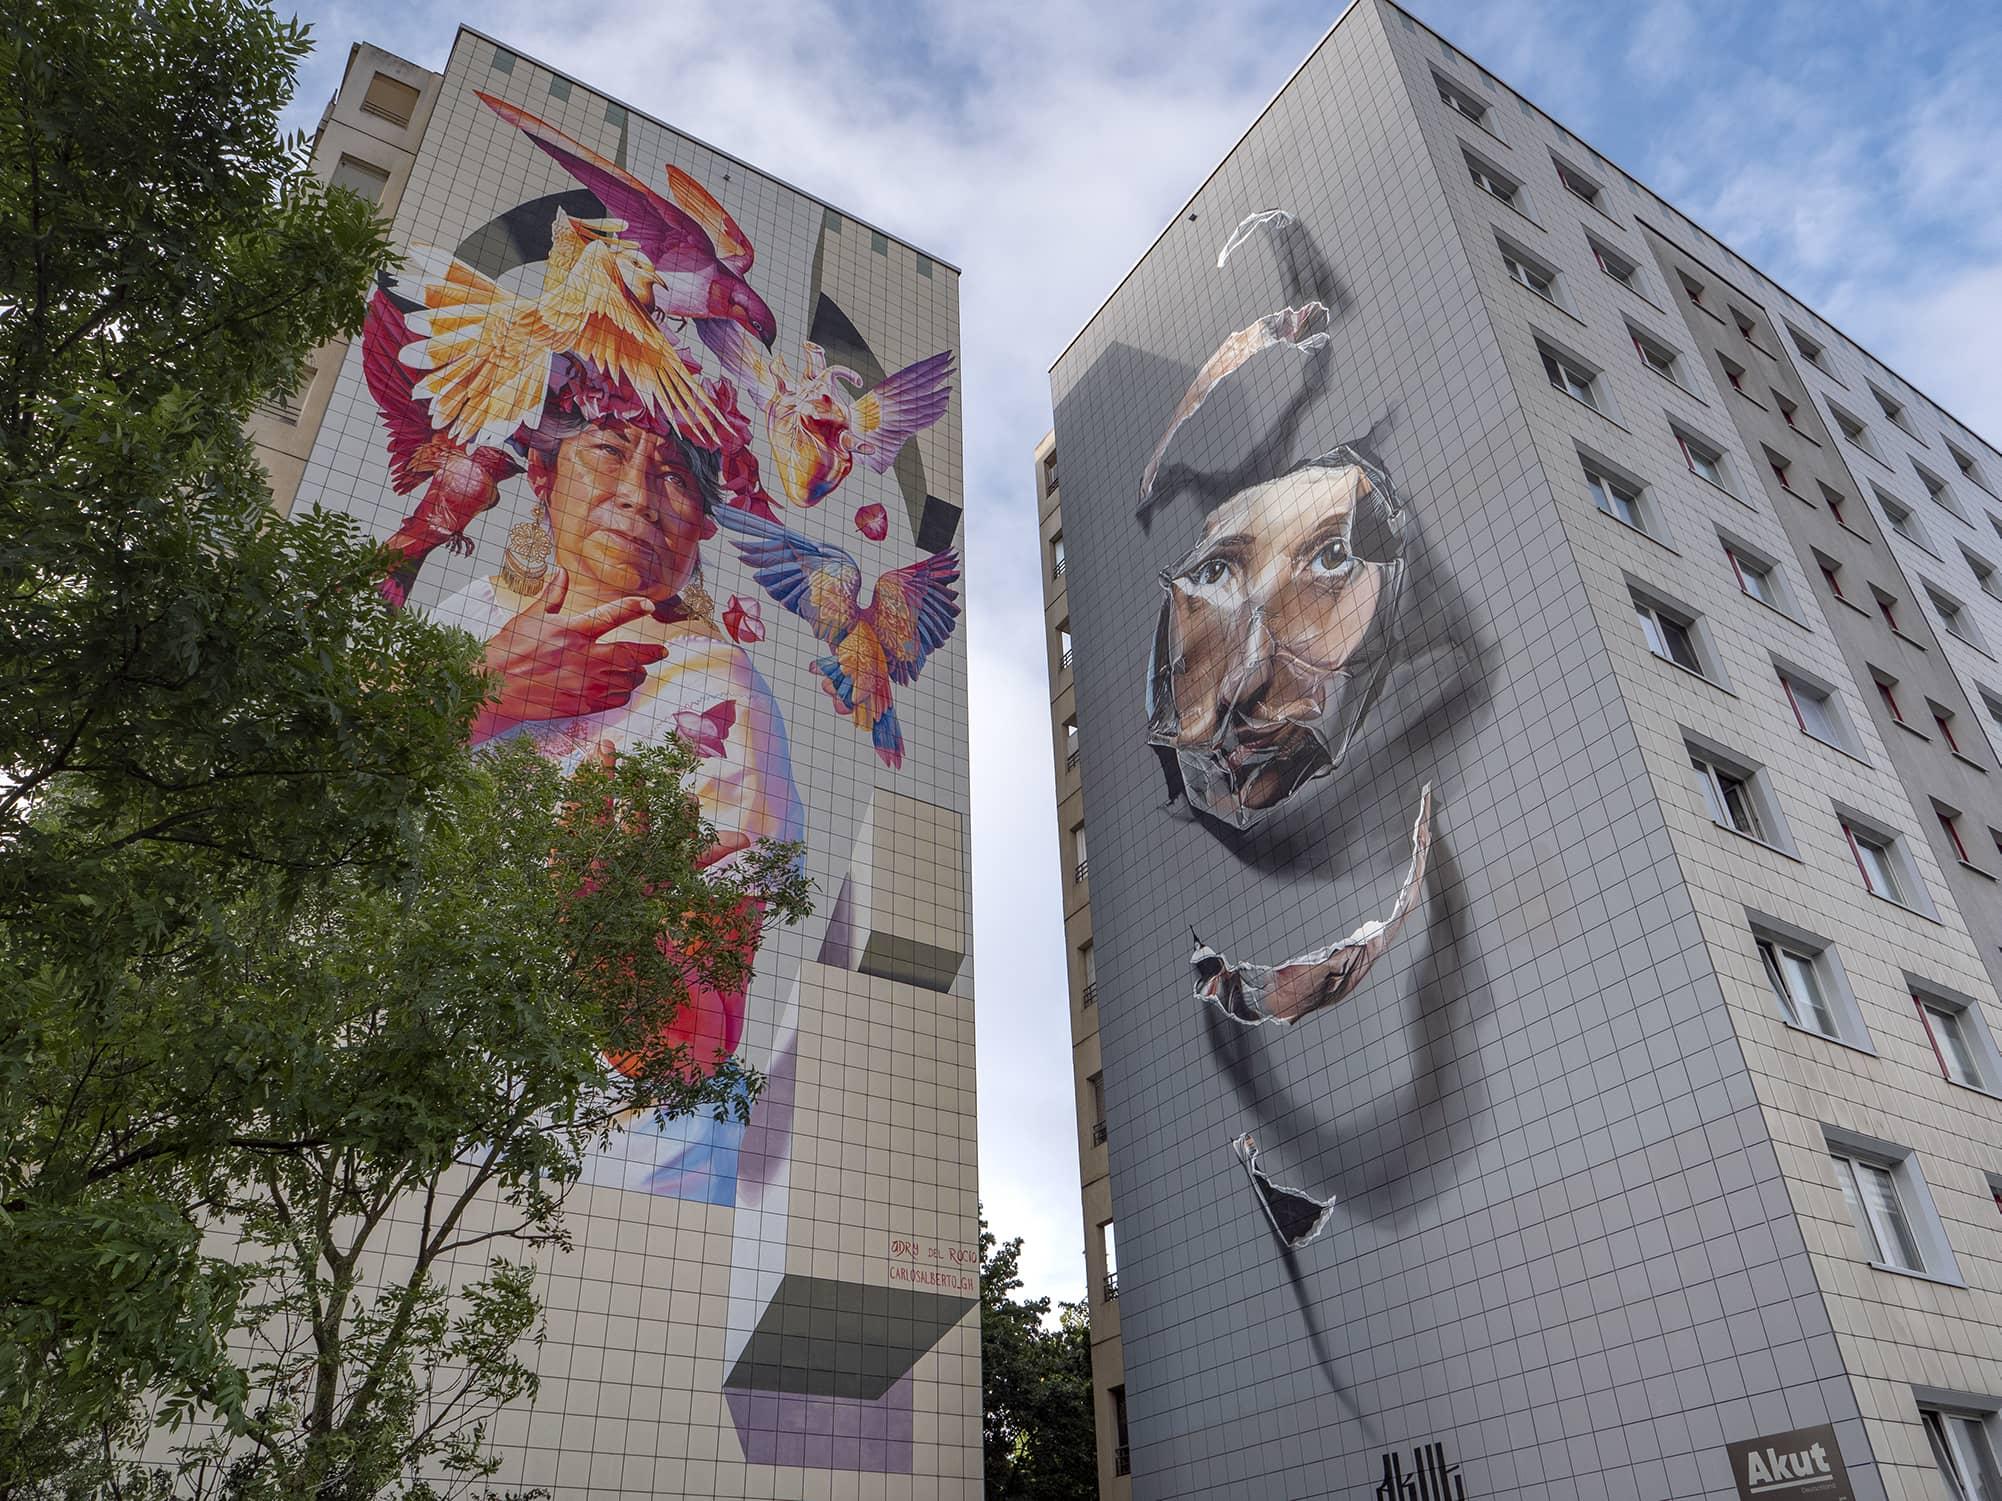 Berlin Streetart Adry del rocio Akut